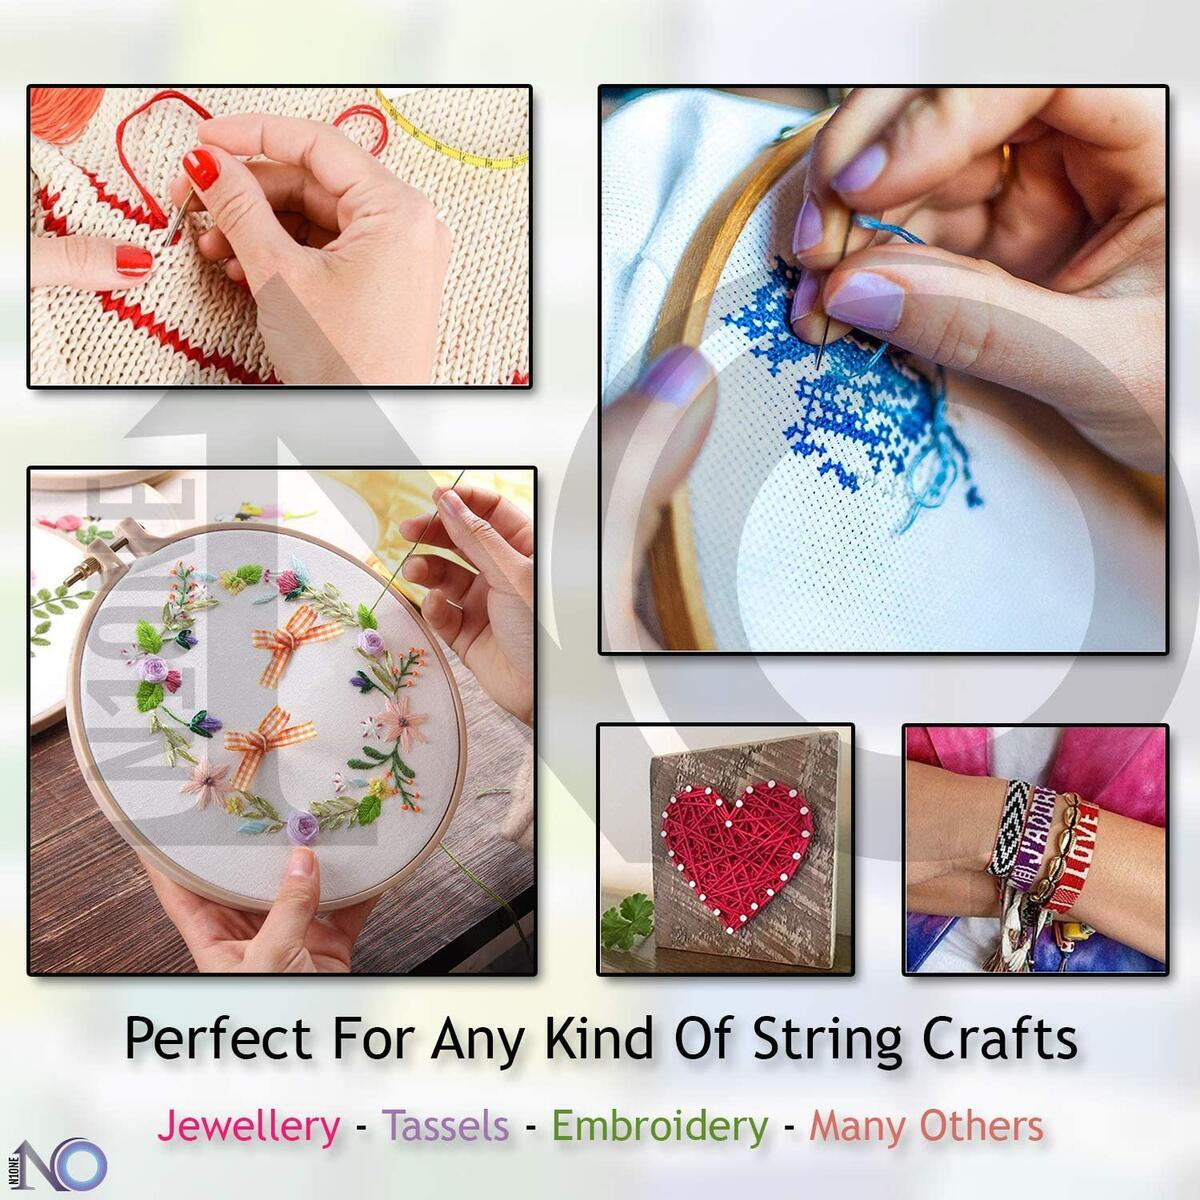 Embroidery Floss Kit for Beginners Friendship Bracelet String Set, 253 Pcs Including 50 Pcs Small Beads for Bracelets, 150 String for Bracelets, 51 Pcs Cross Stitch Kits, 2 x Aida Cloth, 2 x Hoop